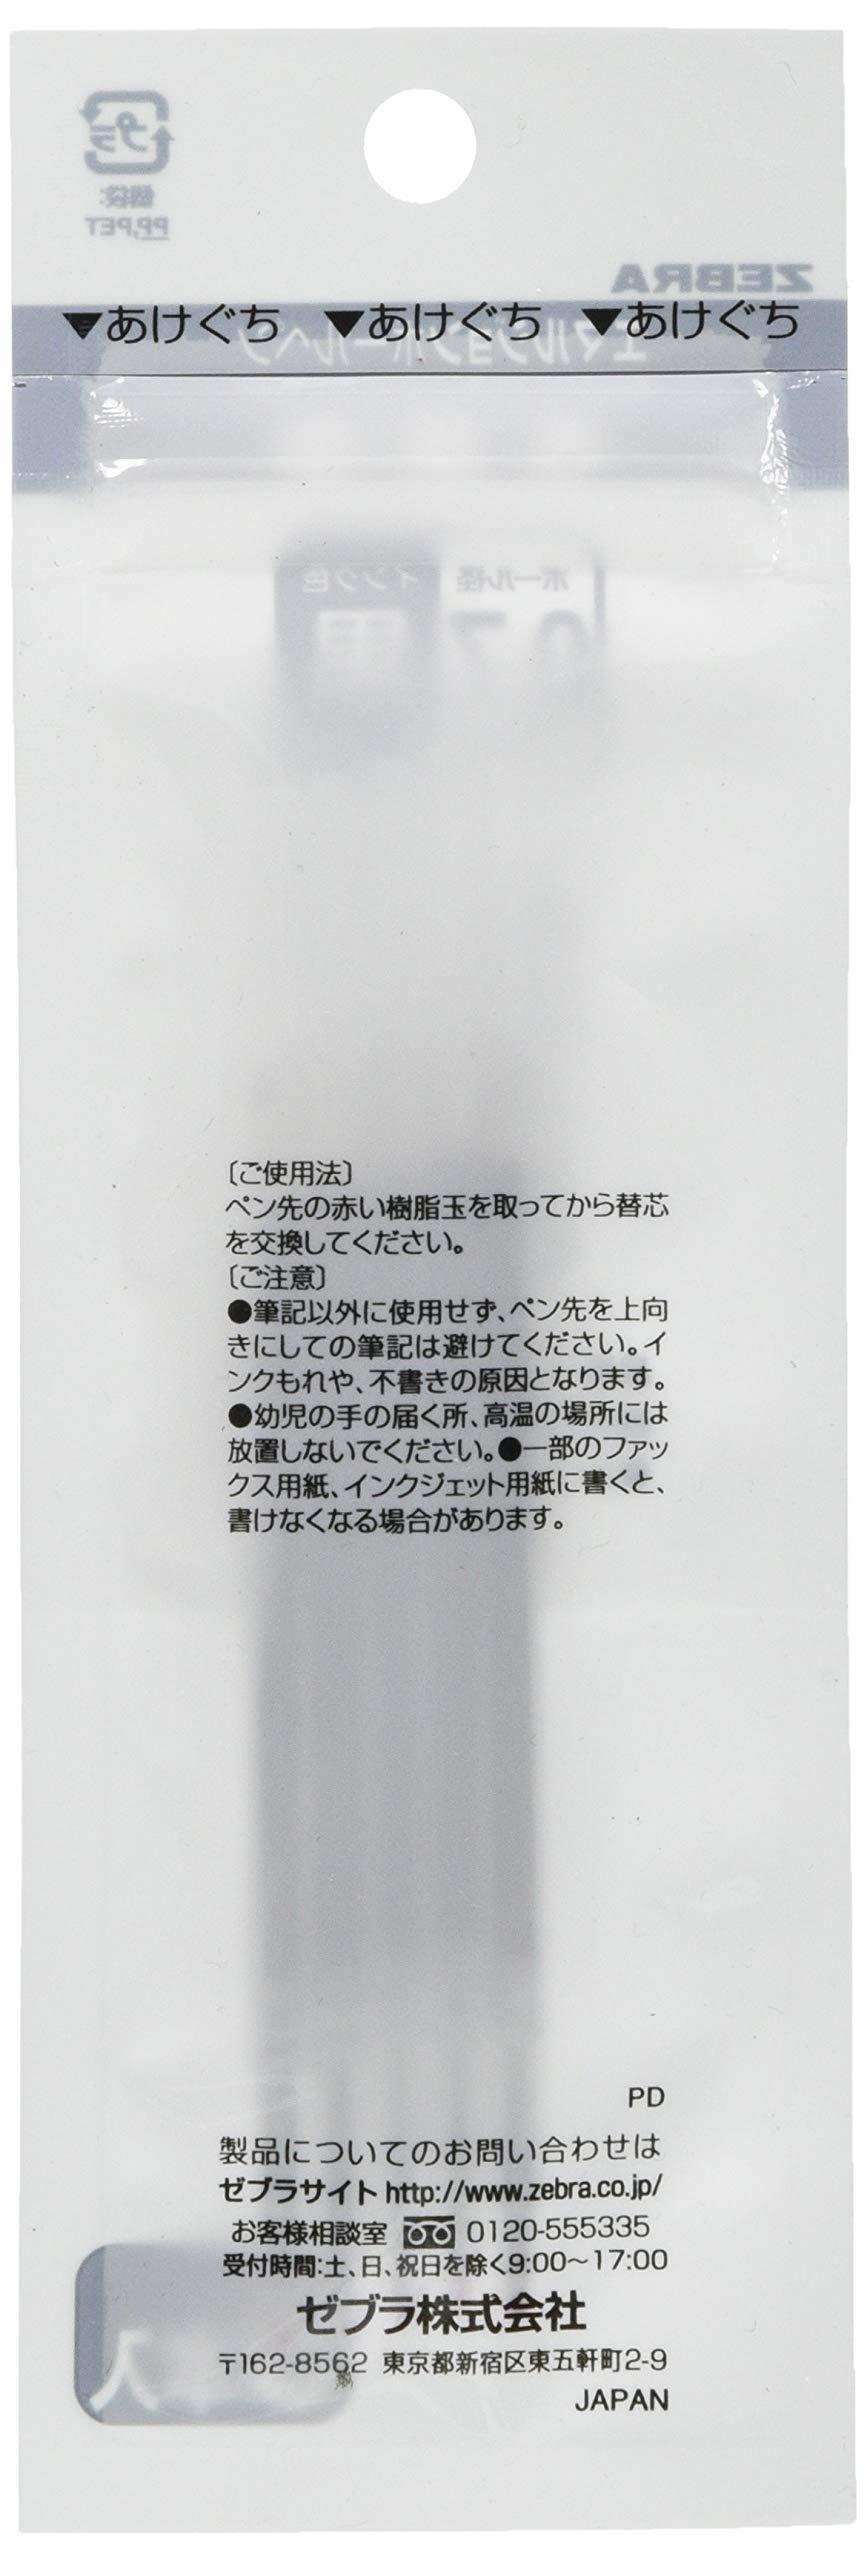 Kyocera water ball-point pen refill core ceramic roller auto C-300 black 5